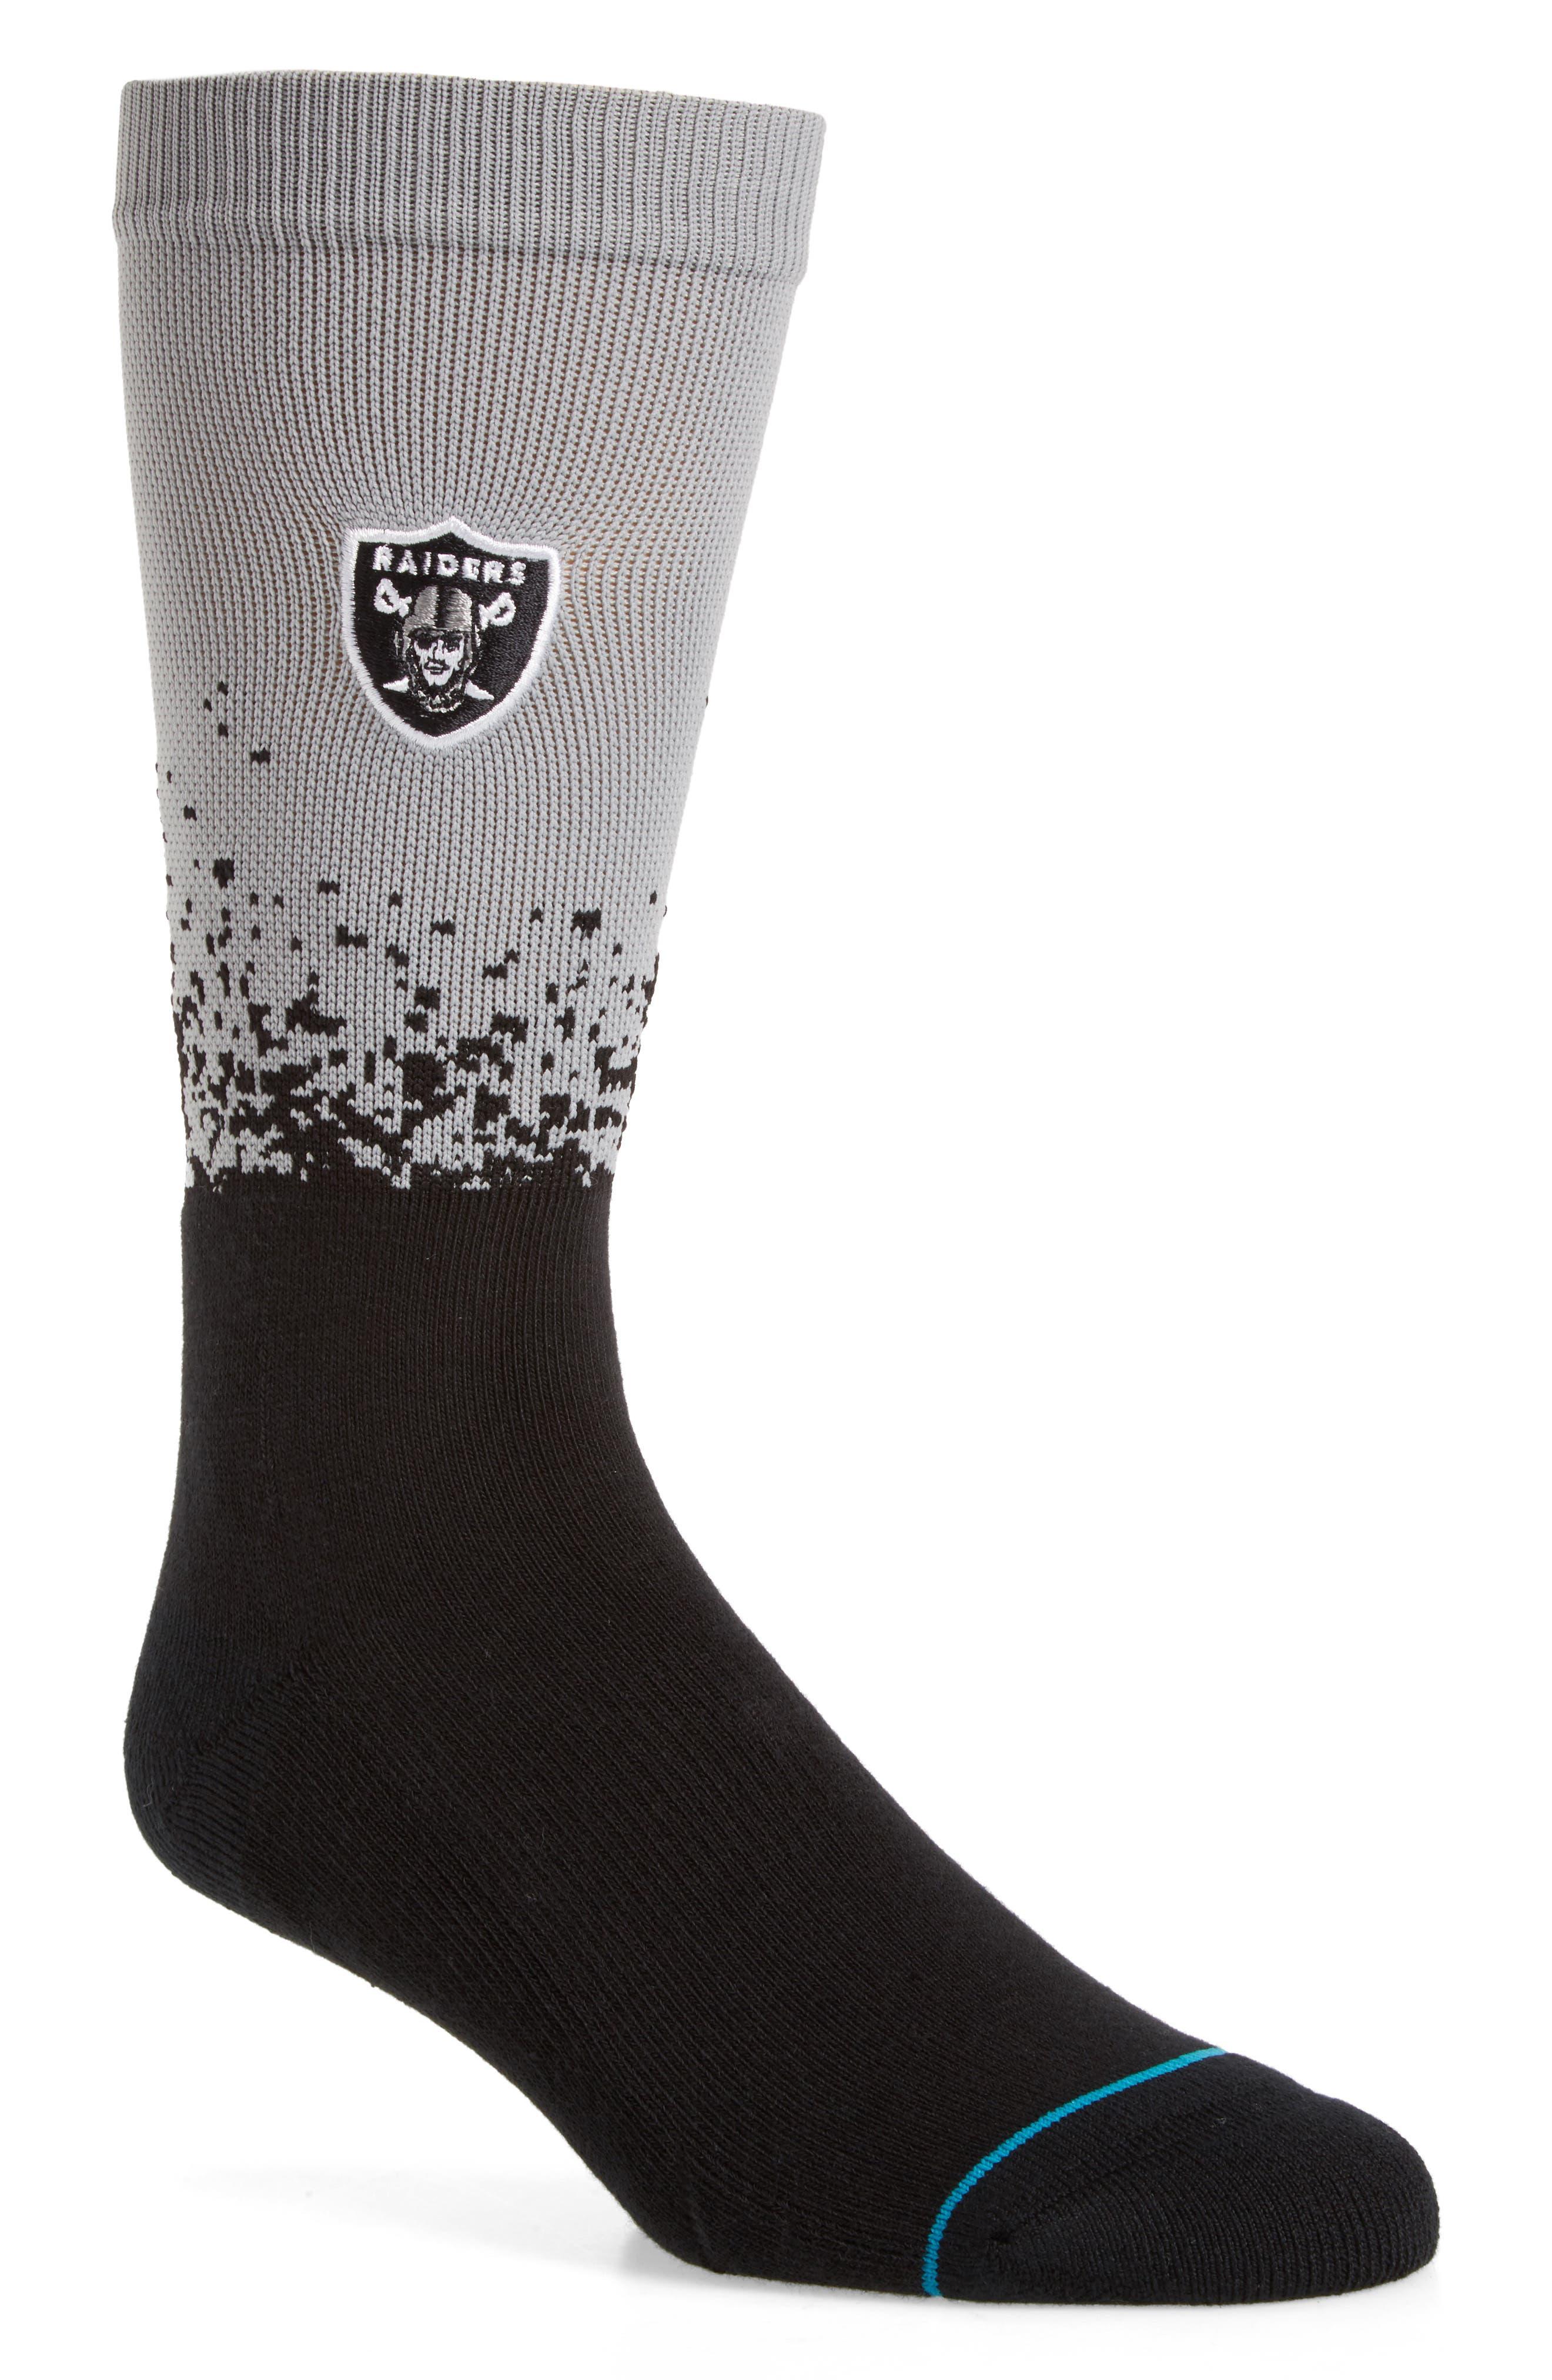 Oakland Raiders - Fade Socks,                             Main thumbnail 1, color,